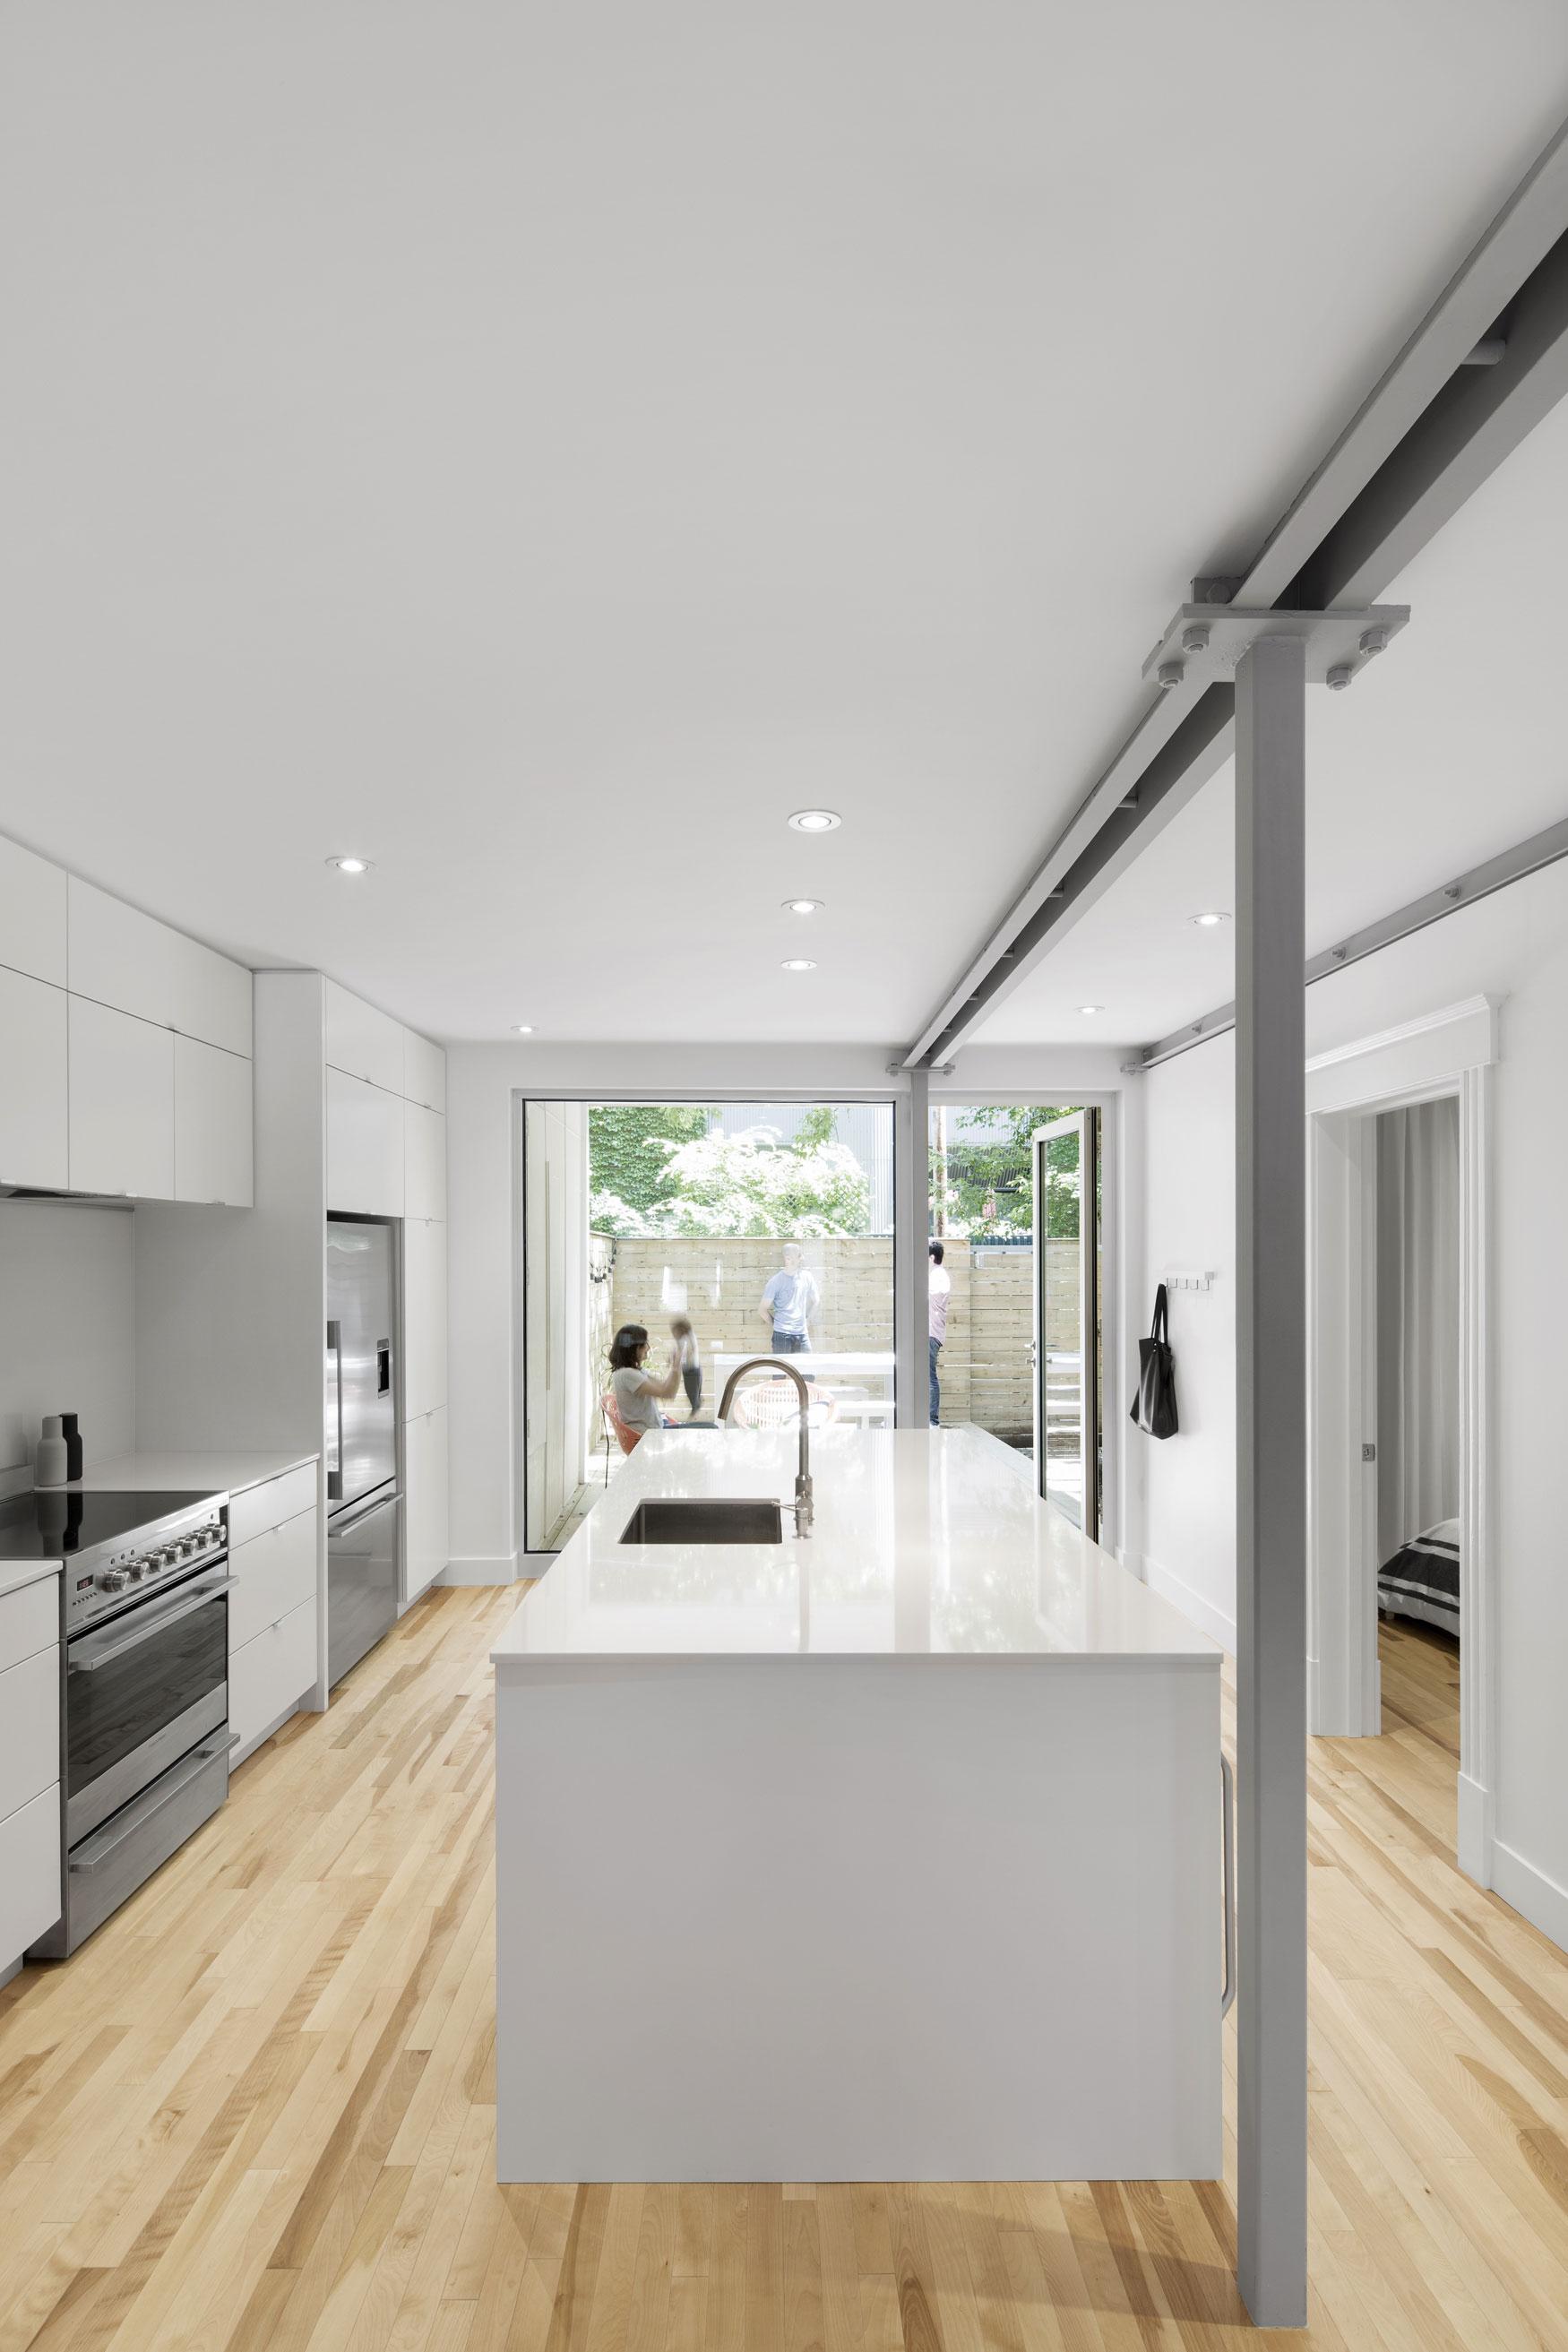 867 De Bougainville Apartment by Bourgeois:Lechasseur architects-04